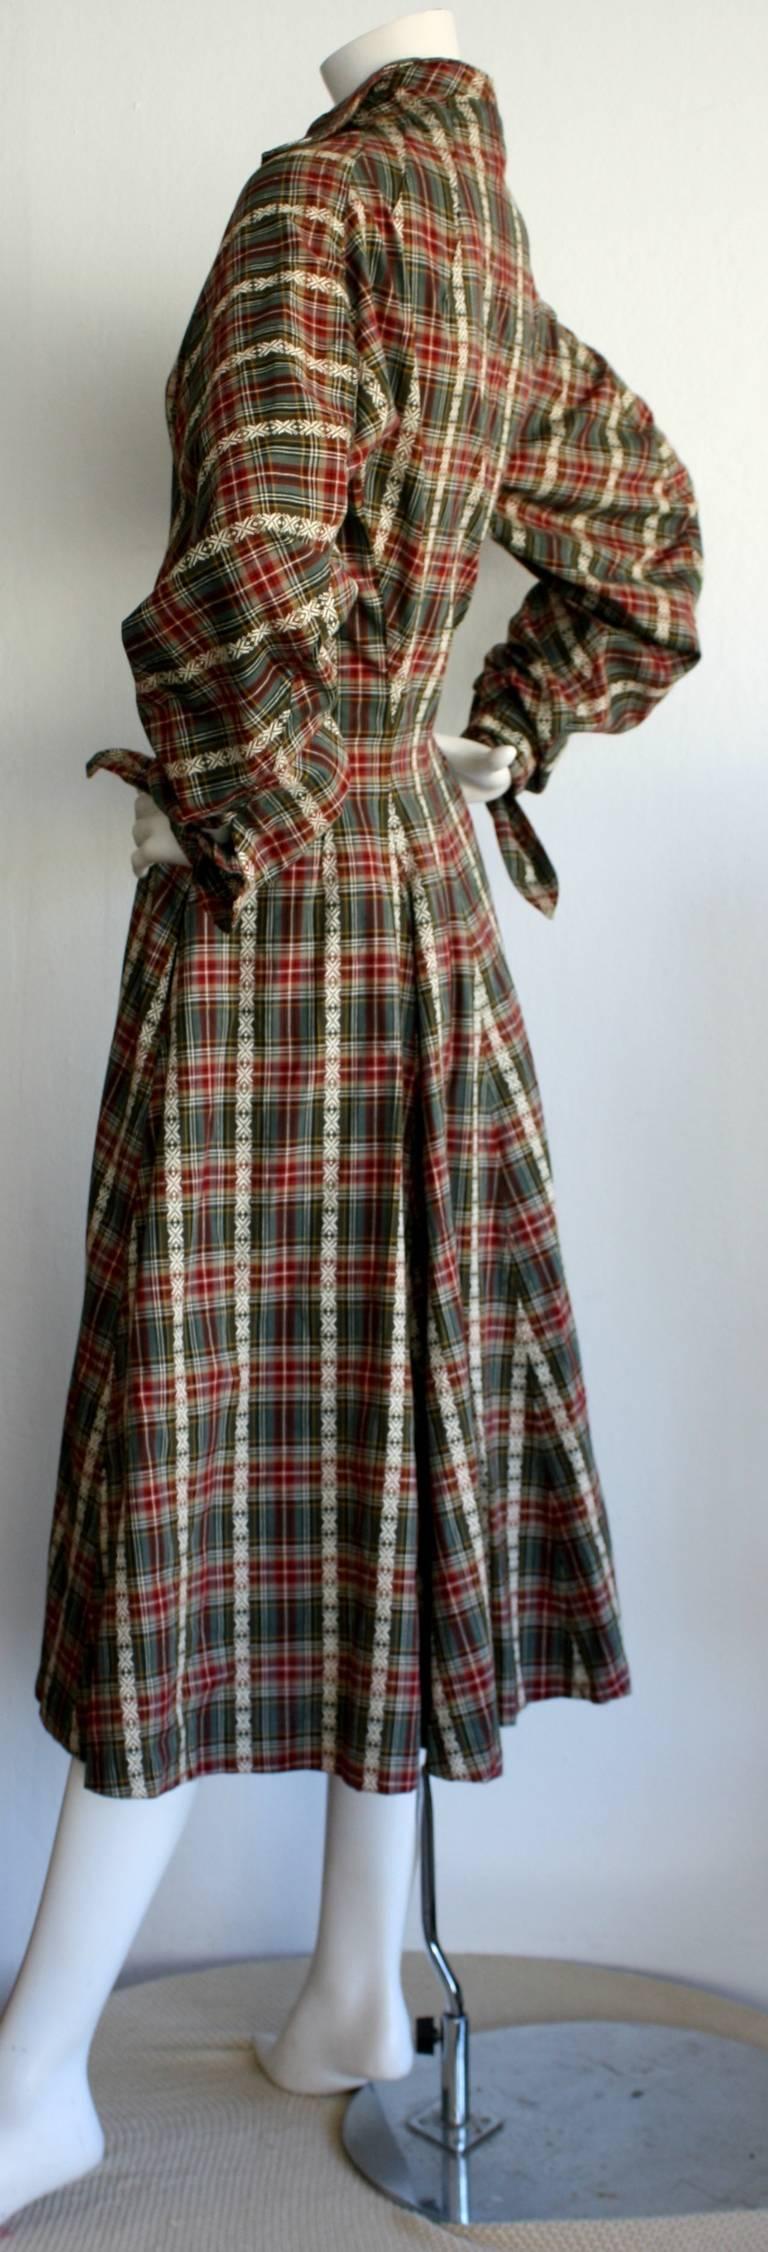 Vintage Byron Lars Tartan Plaid Tie Bow Shirt Dress 5